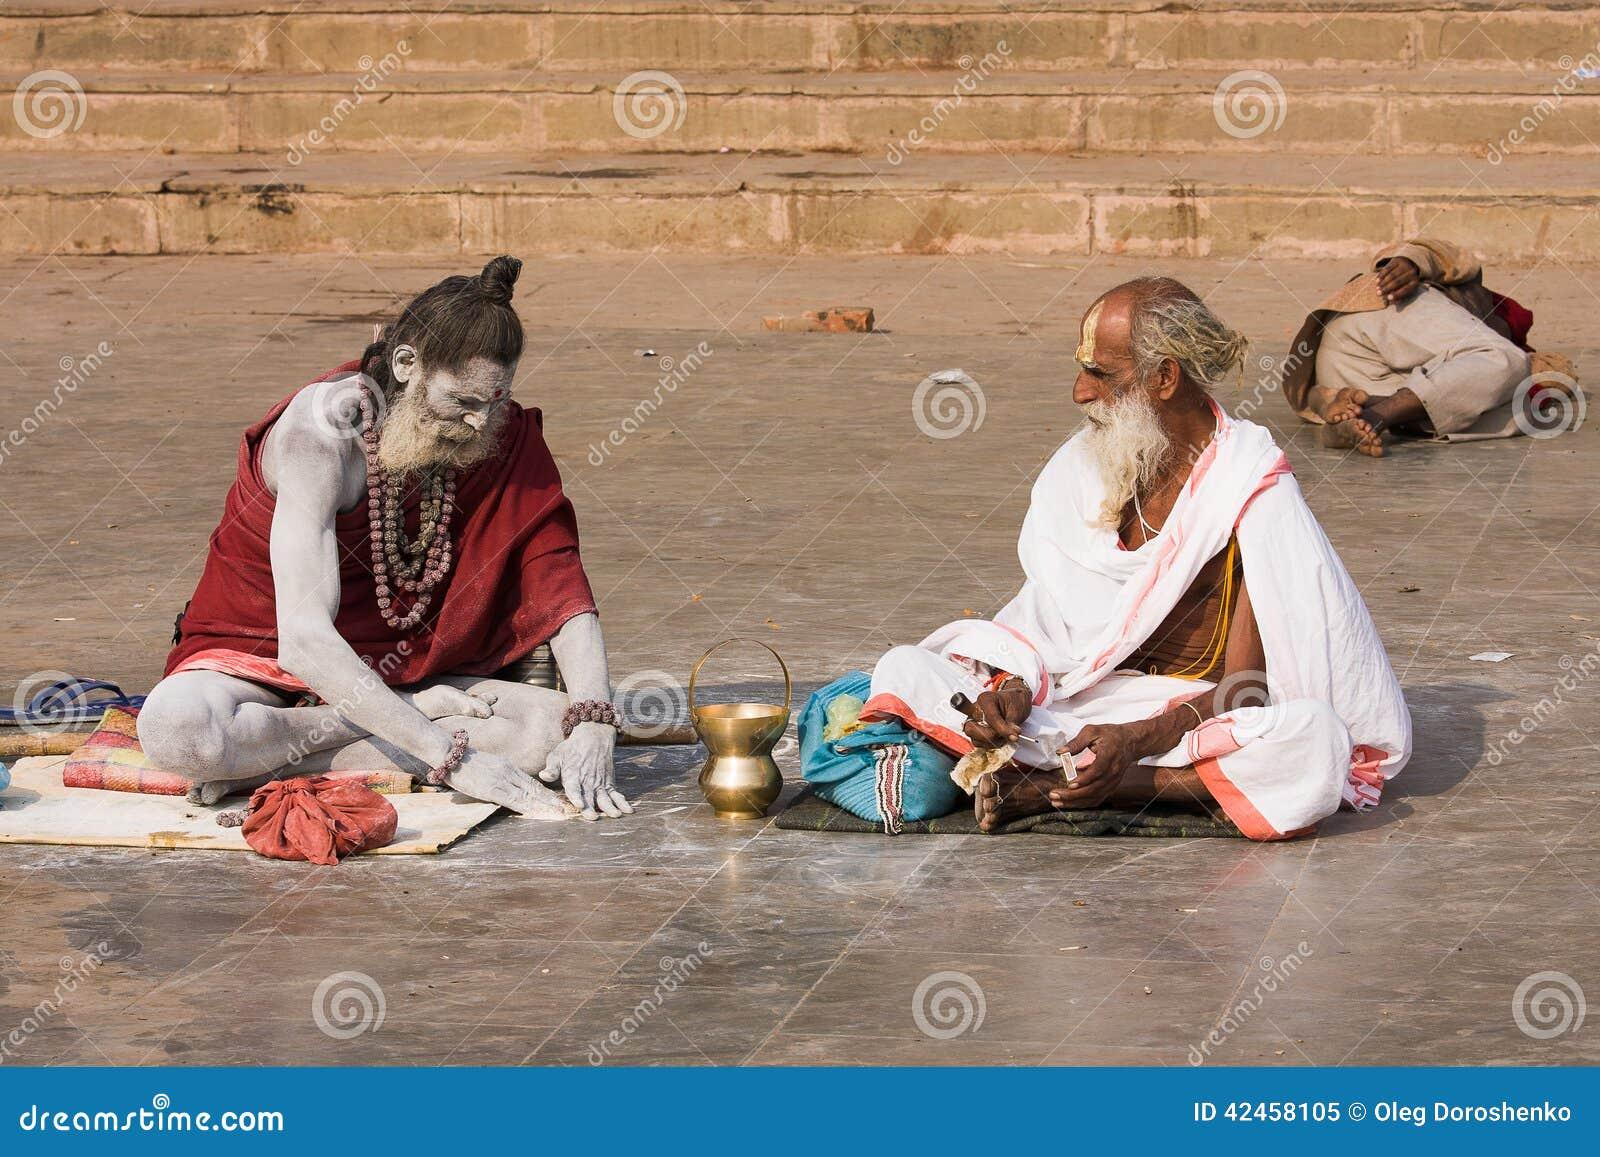 Sadhu sitzt auf dem ghat entlang dem Ganges in Varanasi, Indien